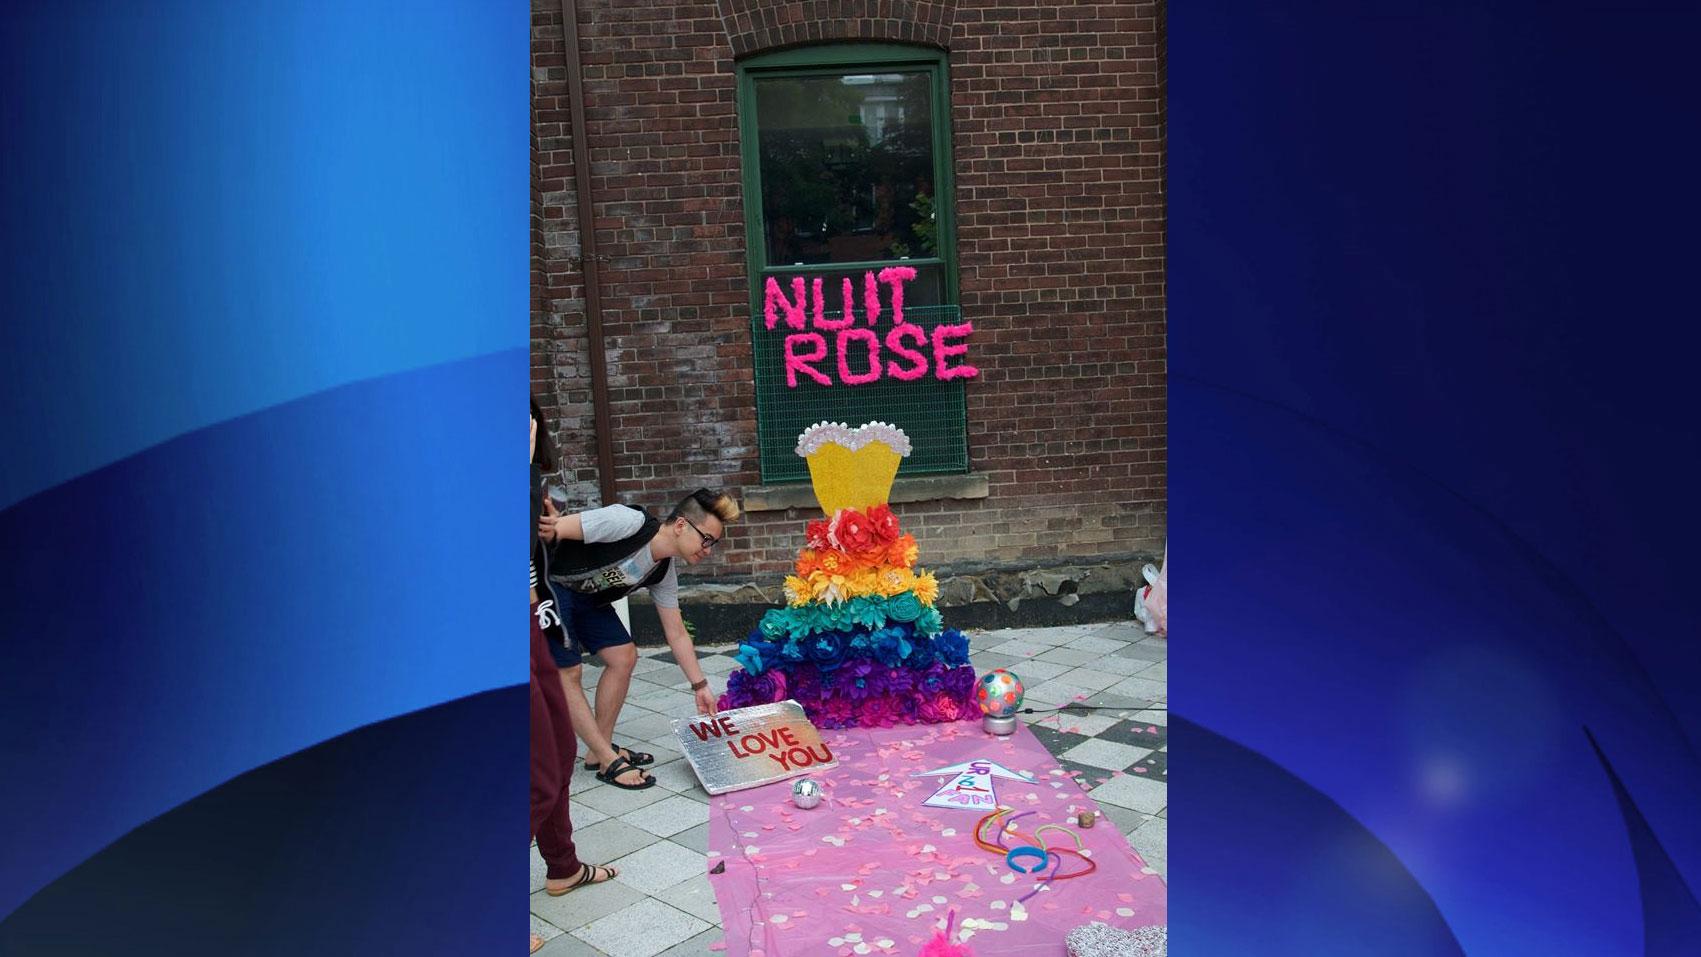 An art installation at Nuit Rose in 2015. Photo via Facebook.com/nuitrosetoronto